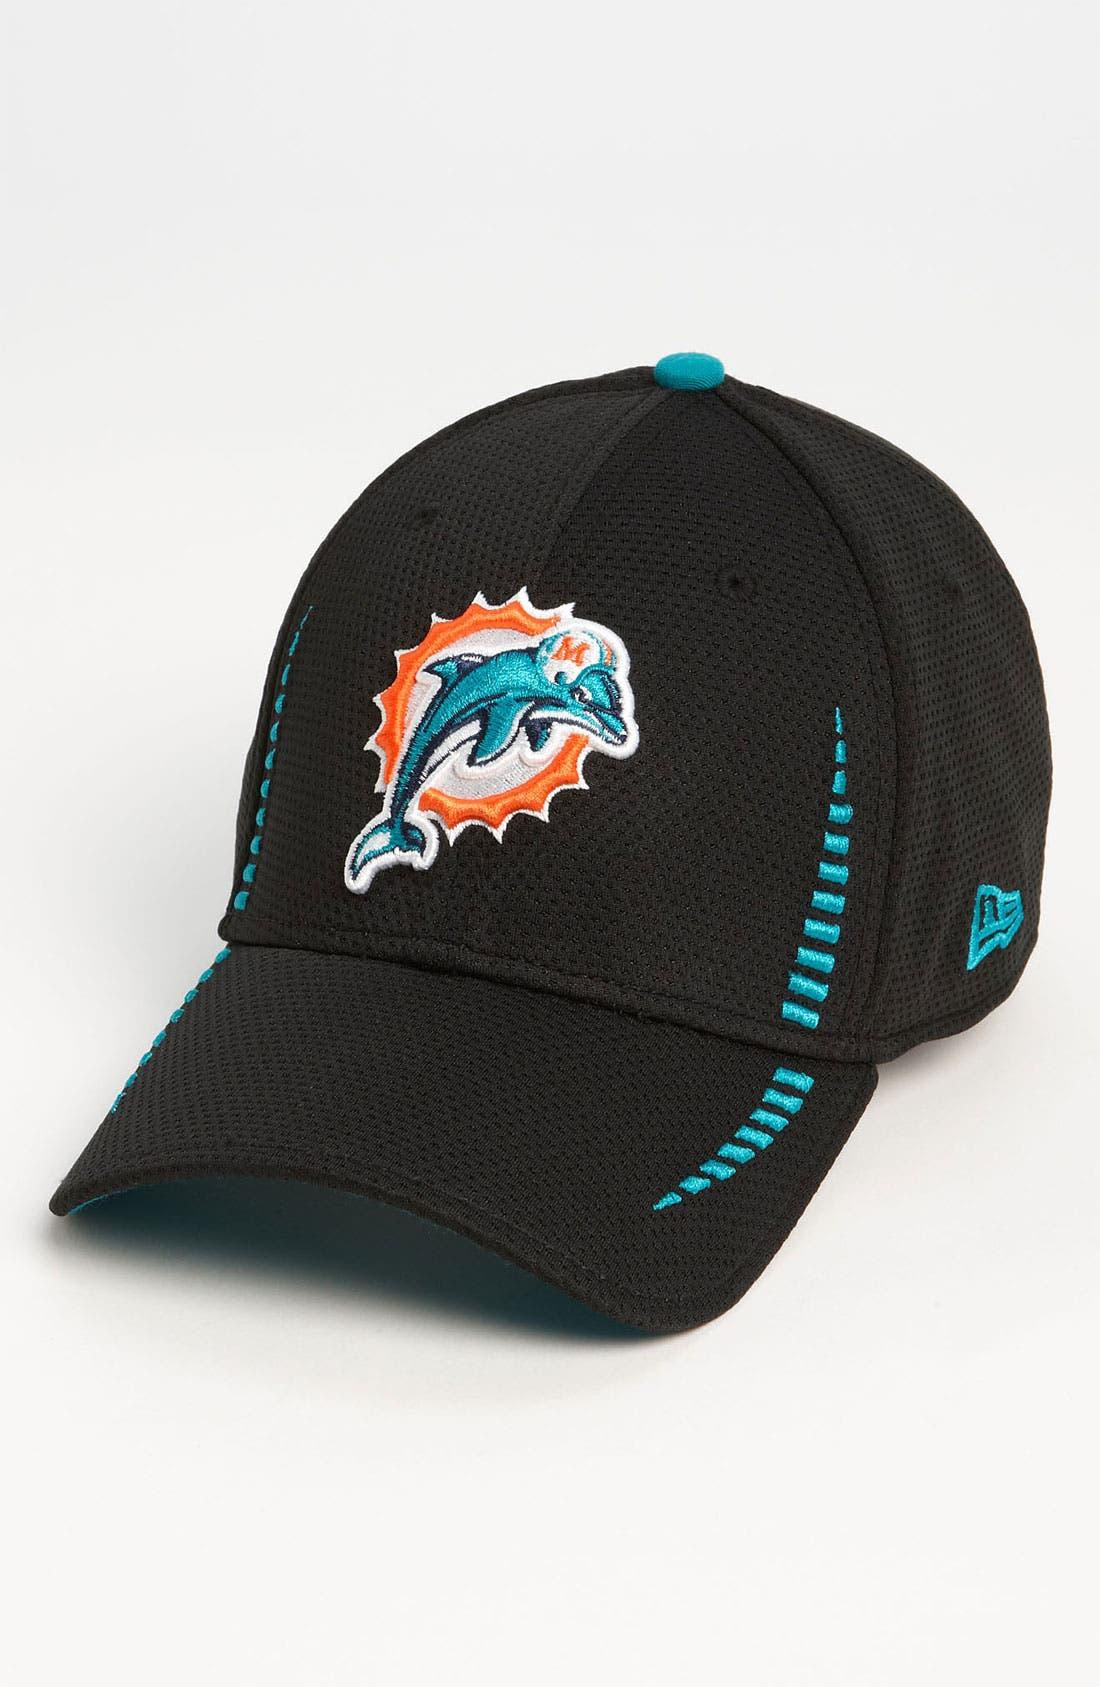 Alternate Image 1 Selected - New Era Cap 'Training Camp - Miami Dolphins' Baseball Cap